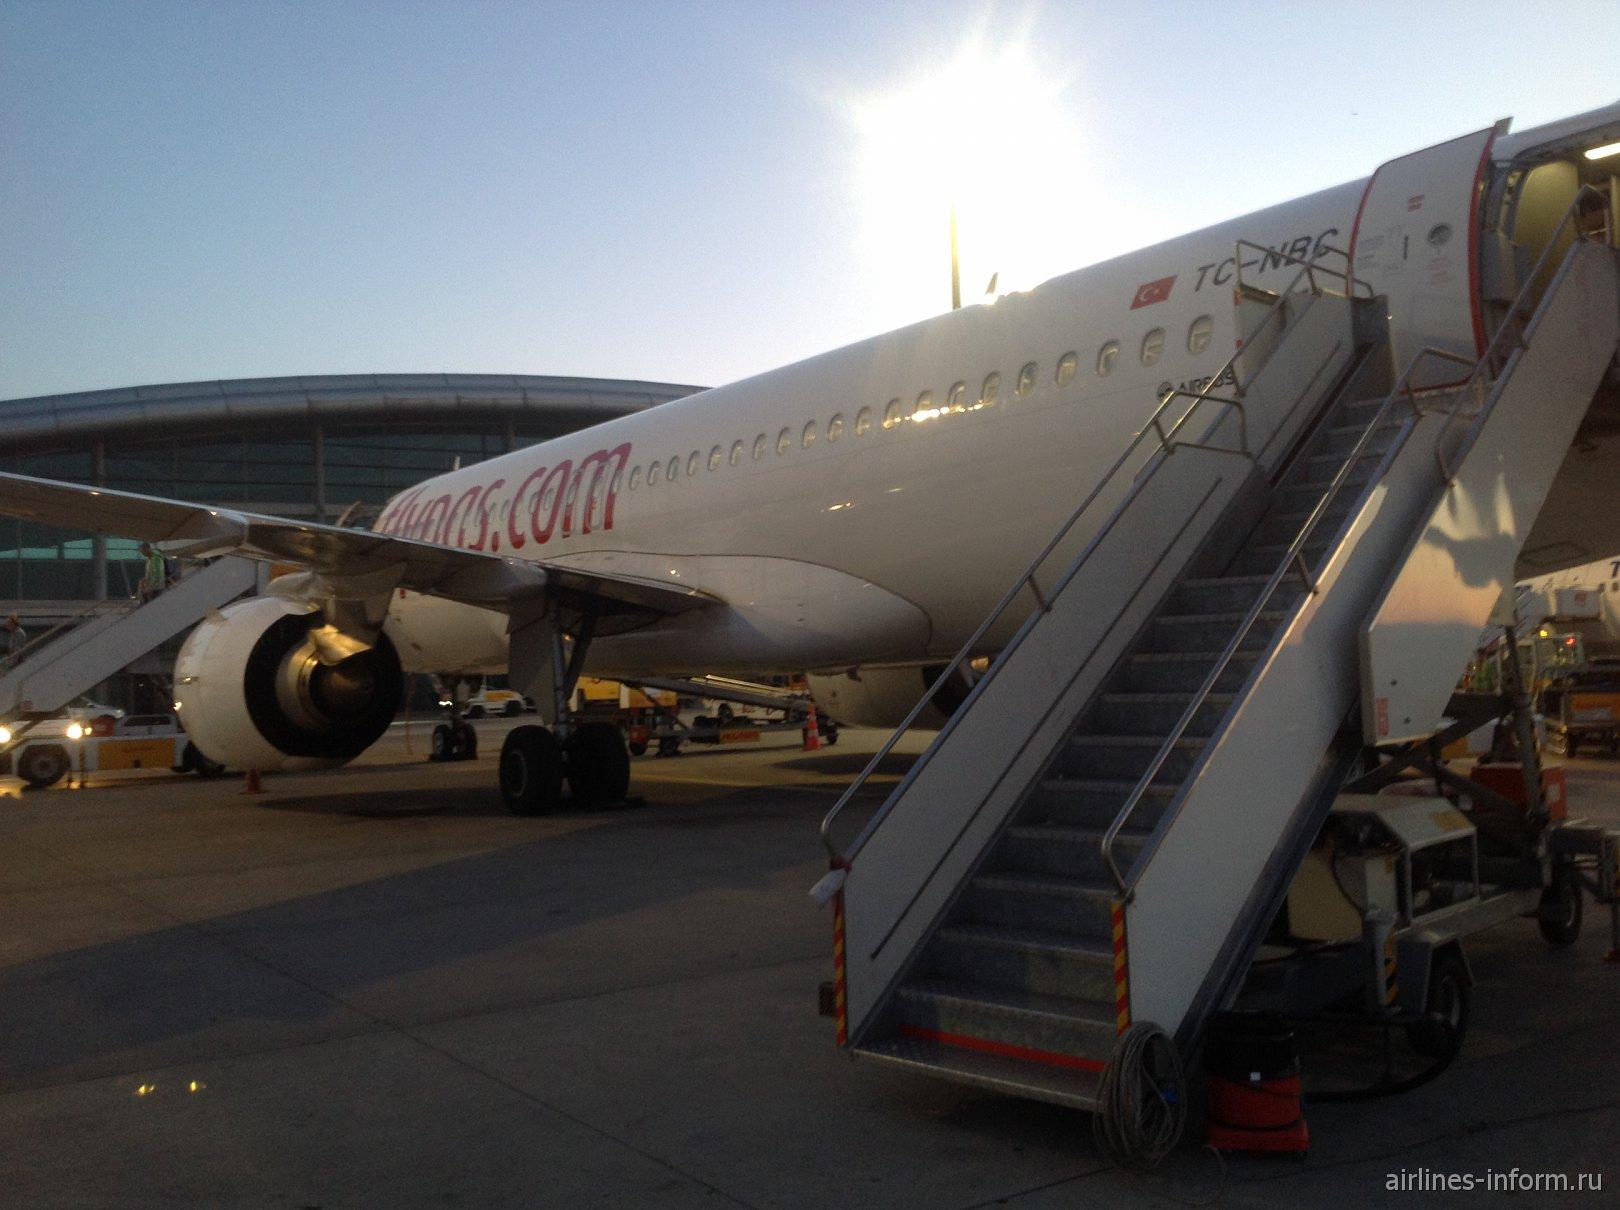 Французские заметки (на Ле Бурже и не только): часть 1 Харьков (HRK) - Стамбул Сабиха Гёкчен (SAW) с Pegasus airlines на A320 (TC-NBC)